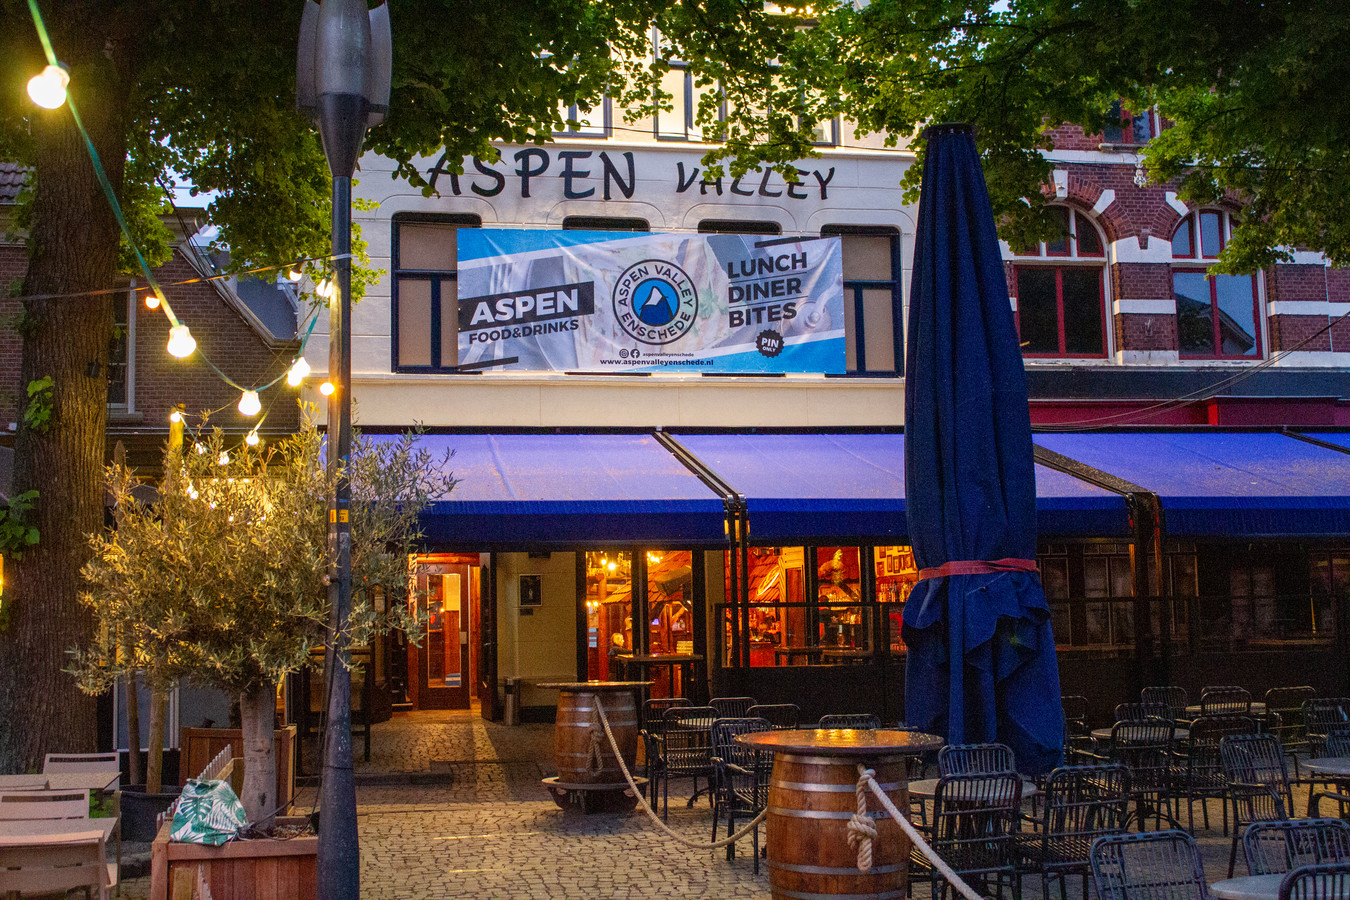 Aspen Valley in Enschede